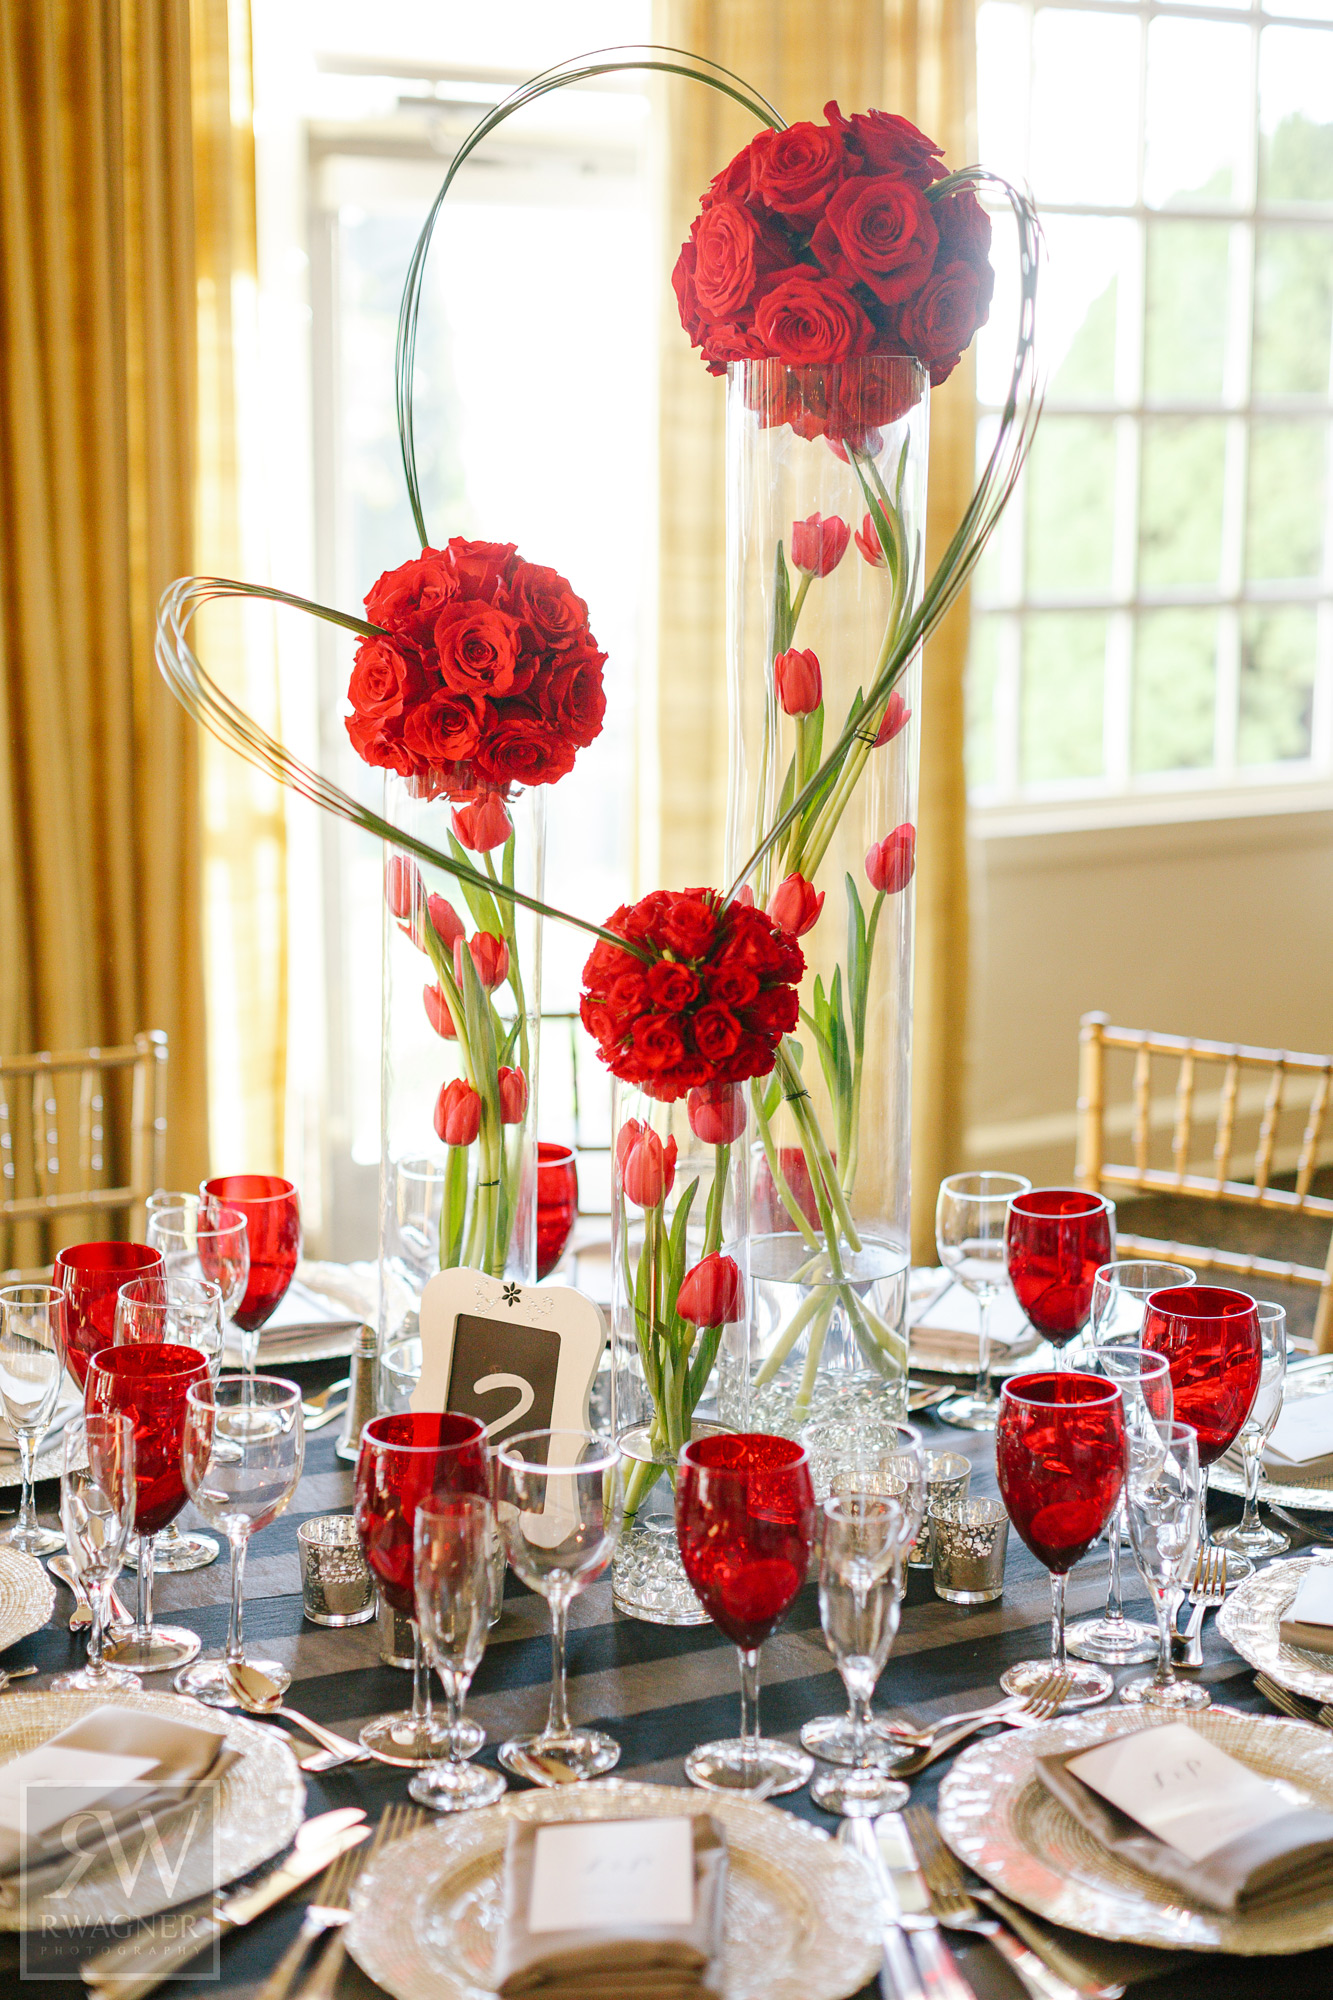 ceci_new_york_luxury_wedding_invitations_couture_red_black_white_real_wedding_dramatic_inn_at_longshore_v286_17.jpg